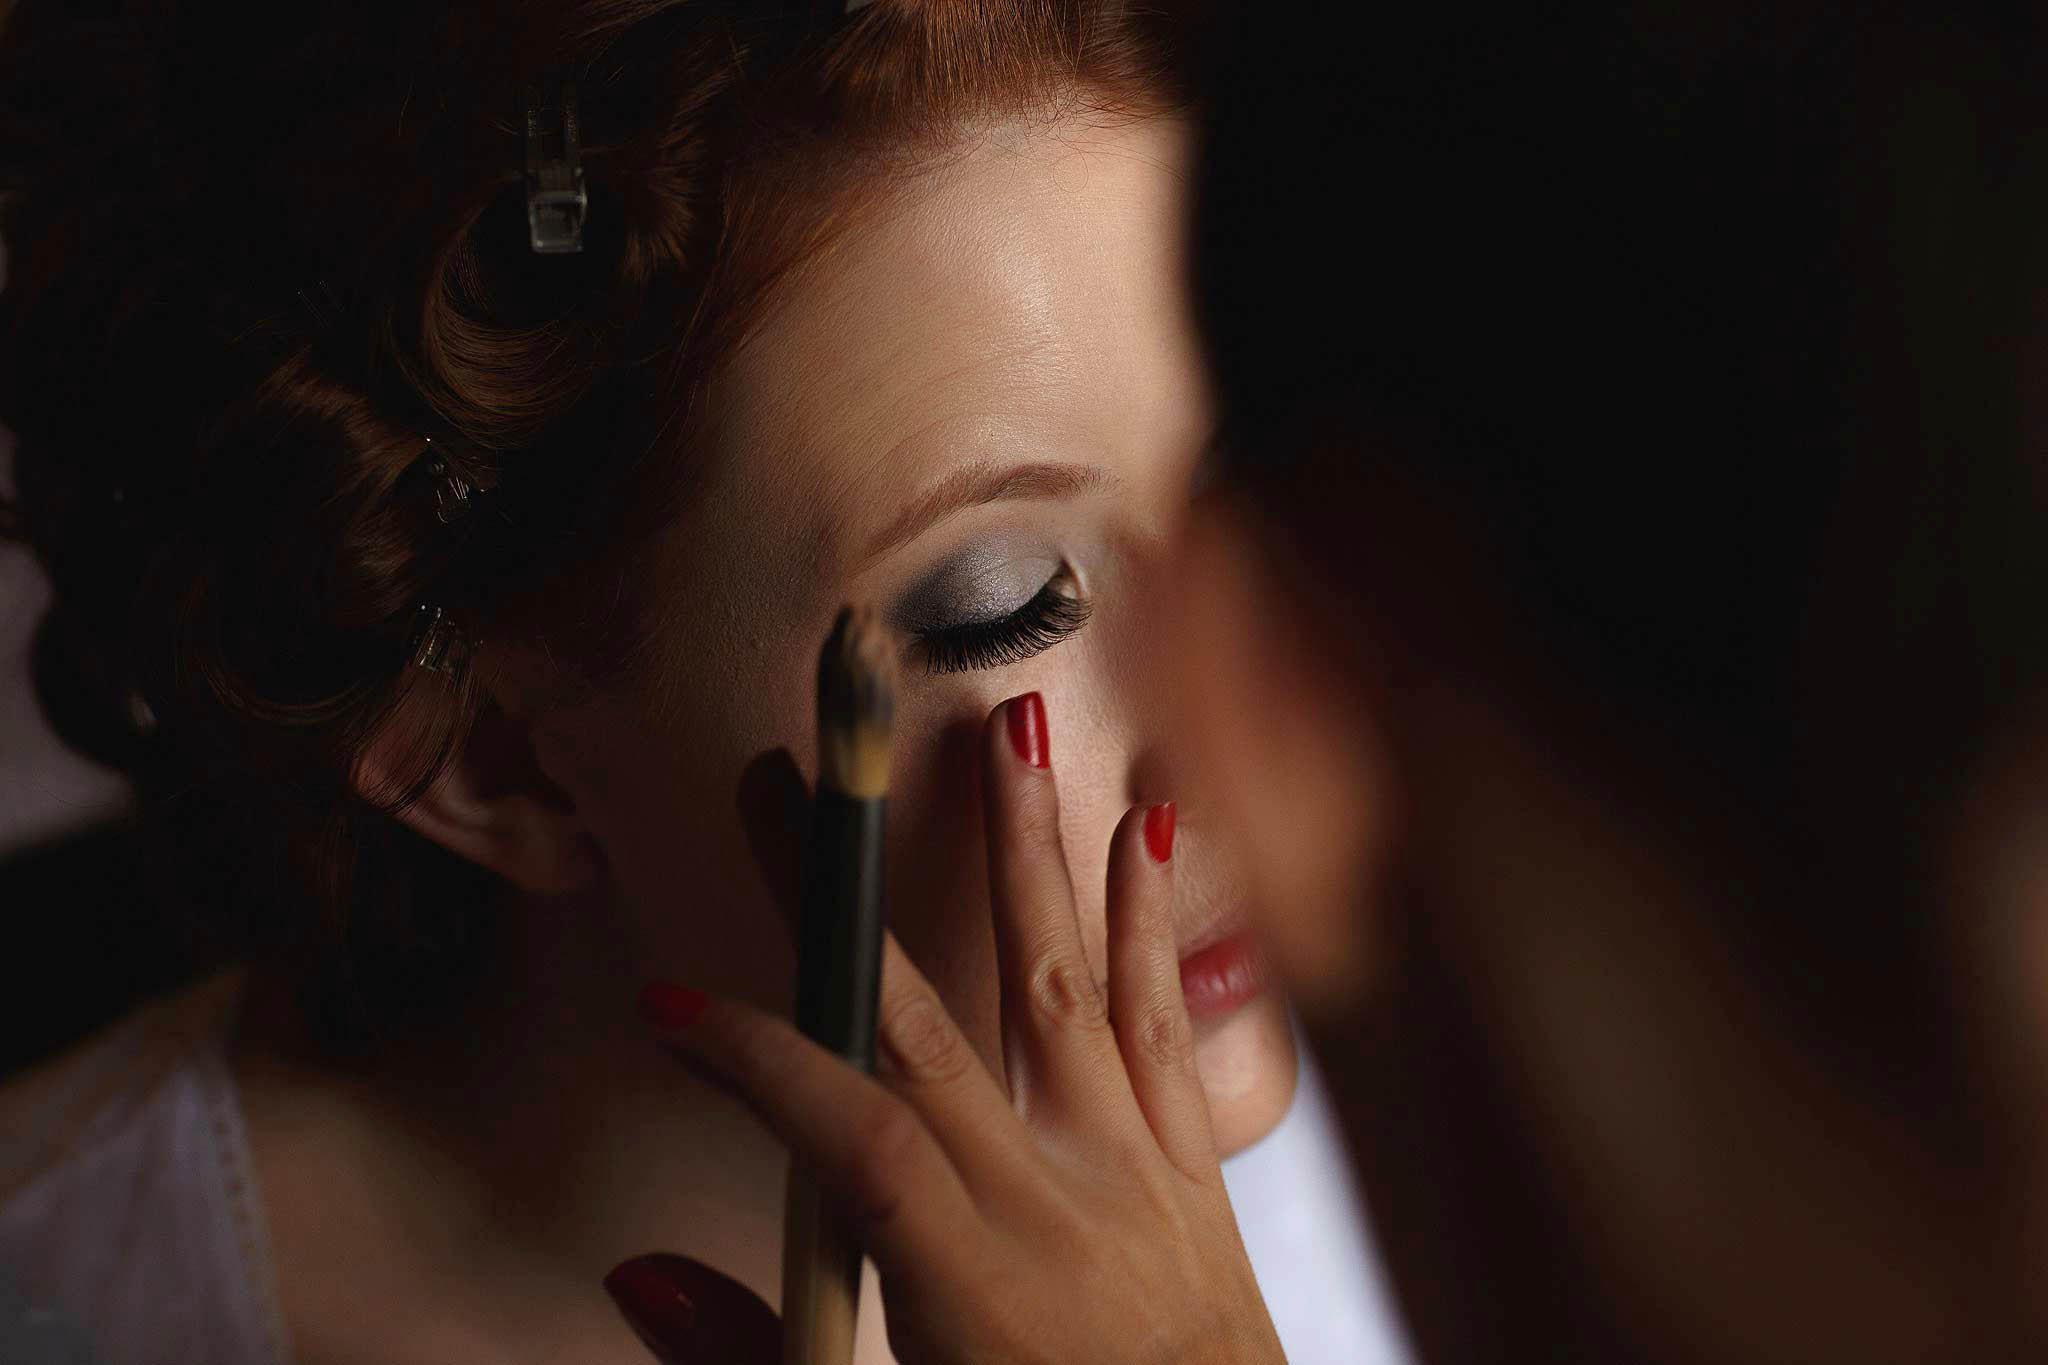 bride having make-up applied at wedding